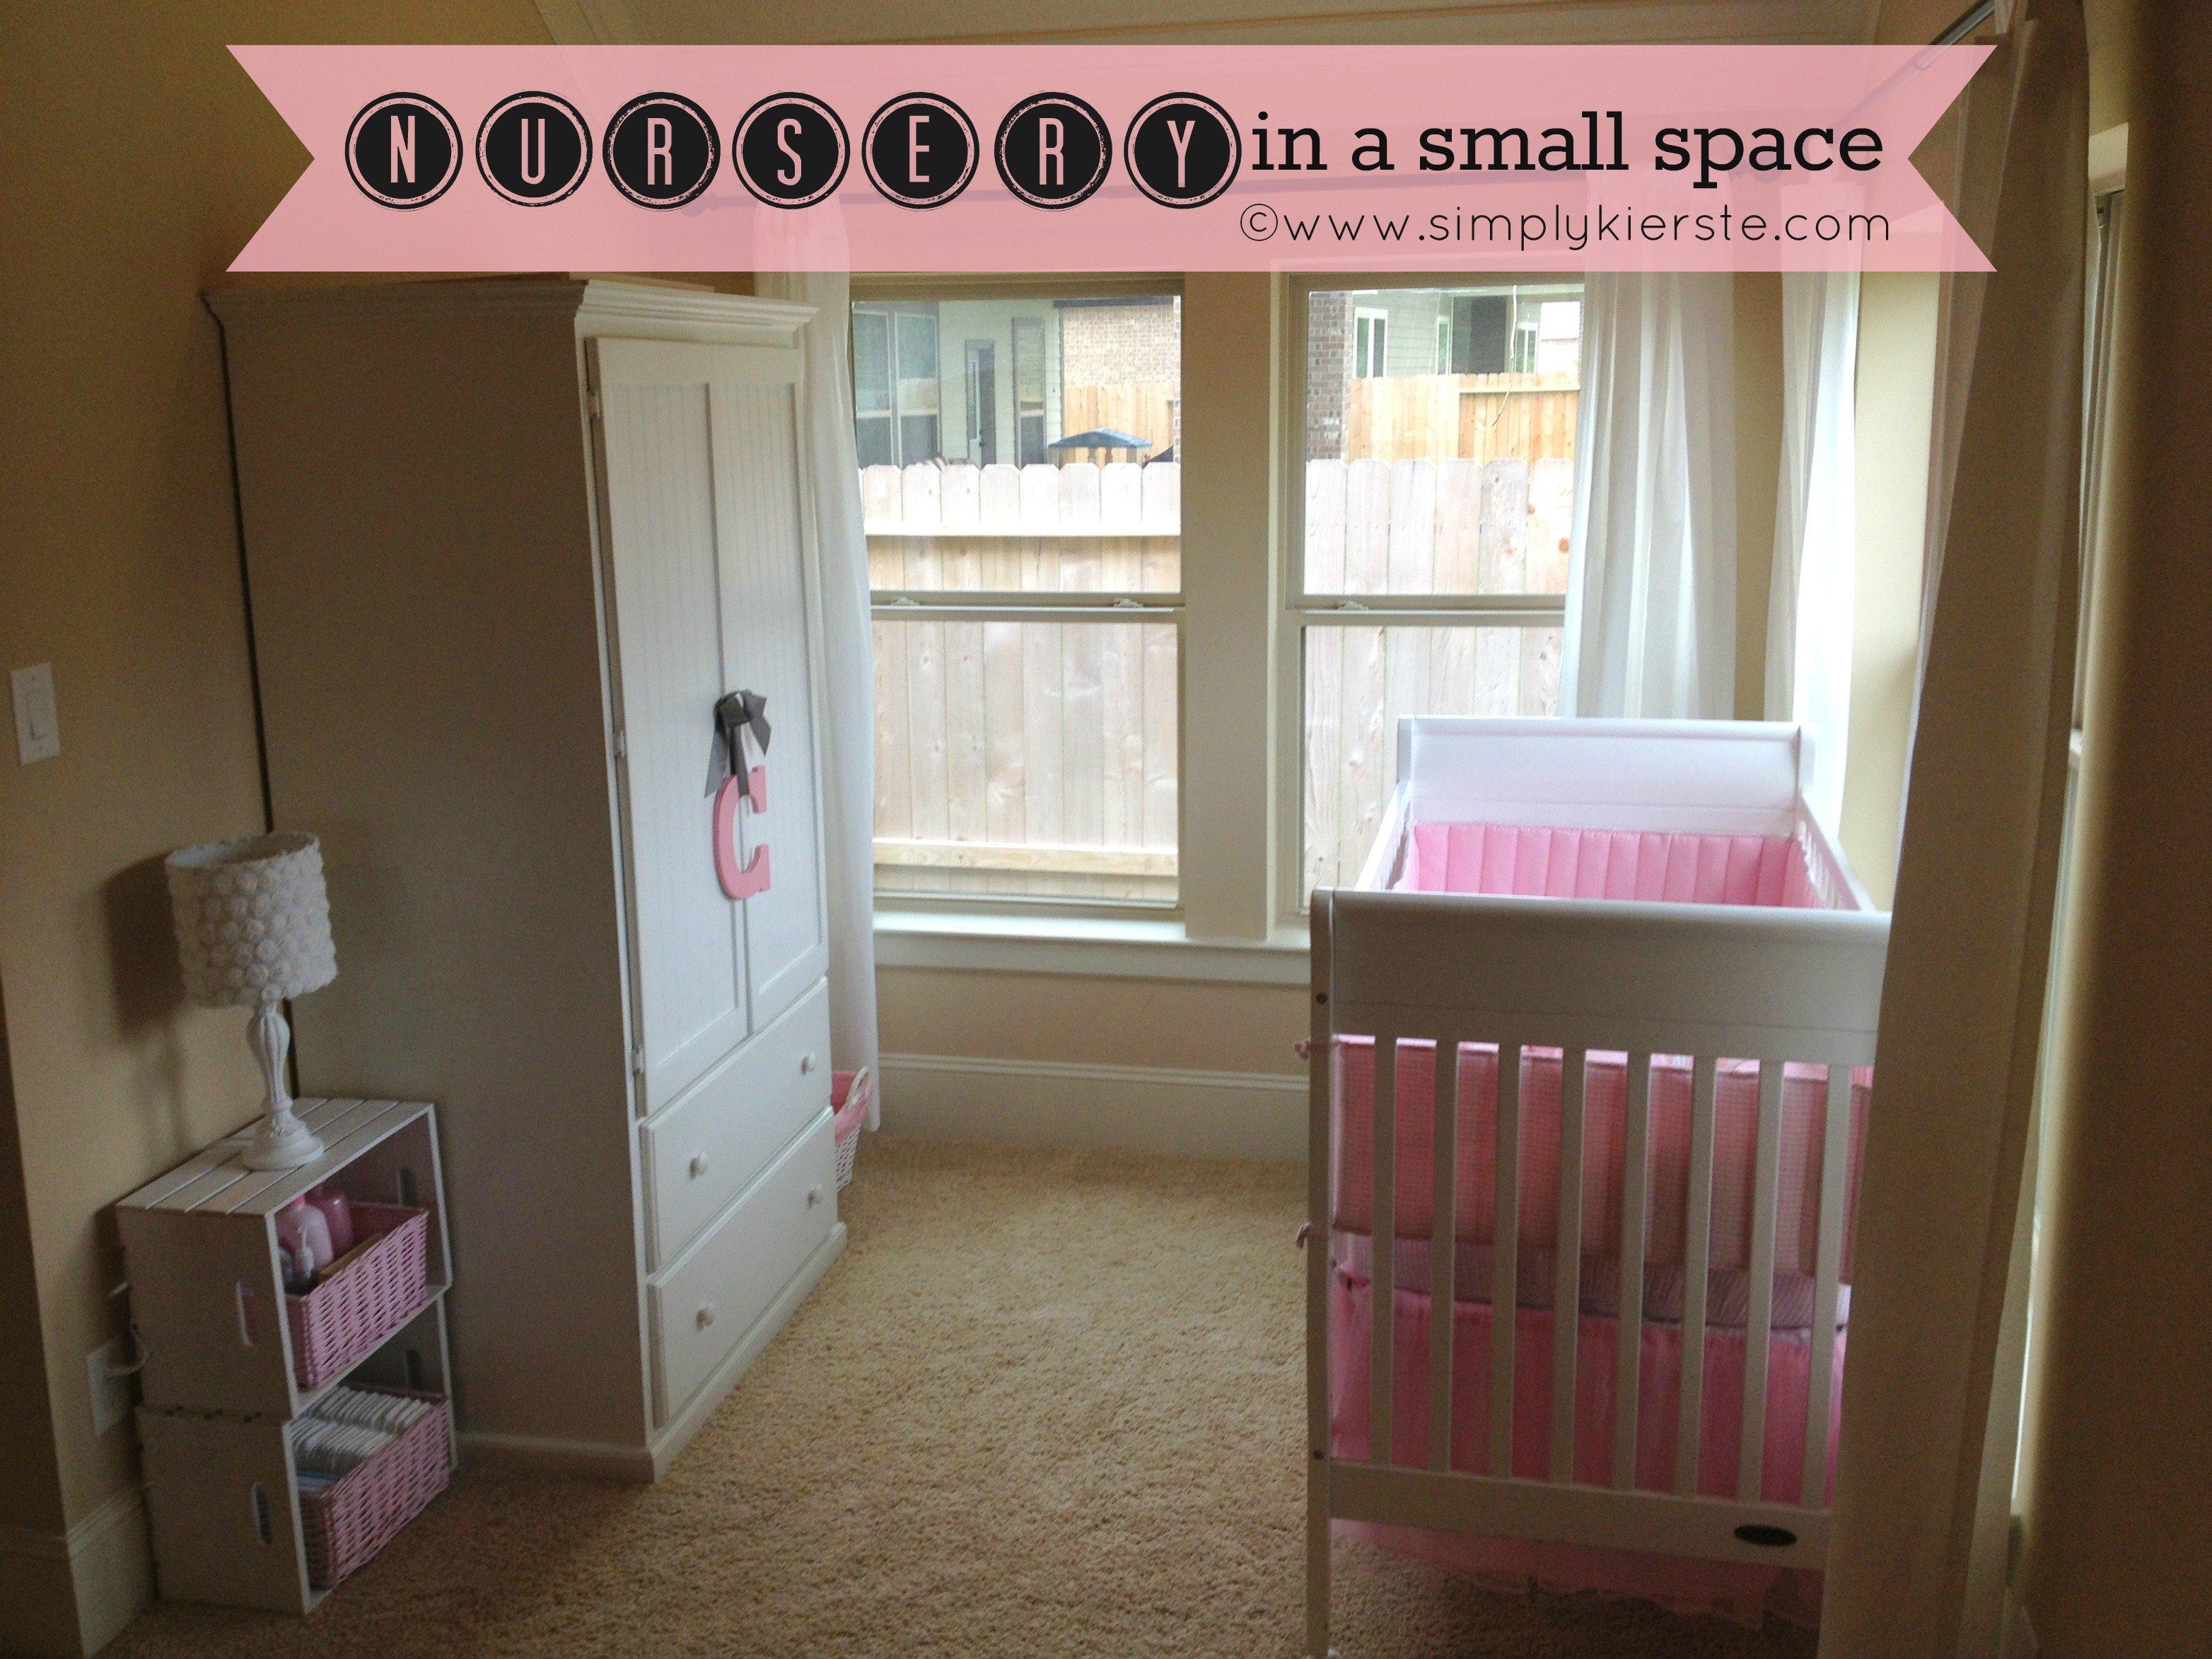 Nursery in a Small Space | simplykierste.com